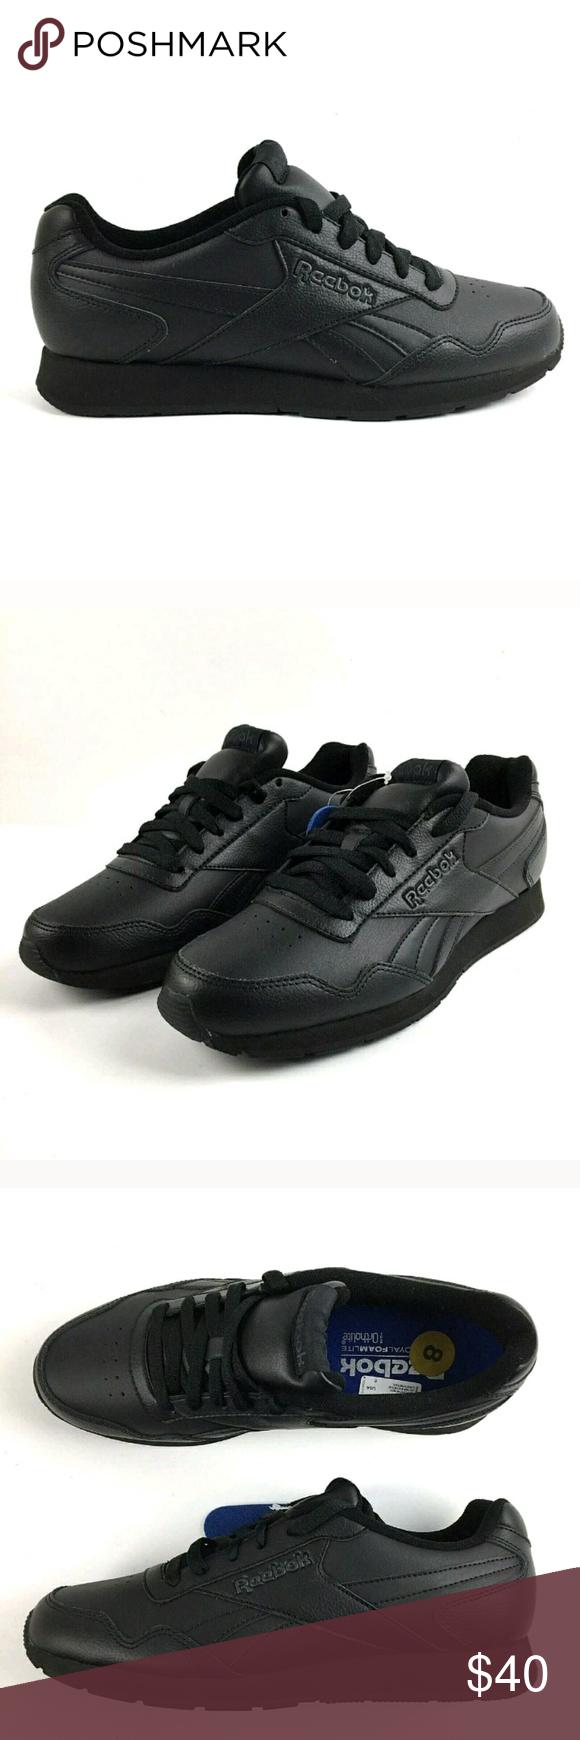 Reebok Royal Foam Lite Lether Sneakers